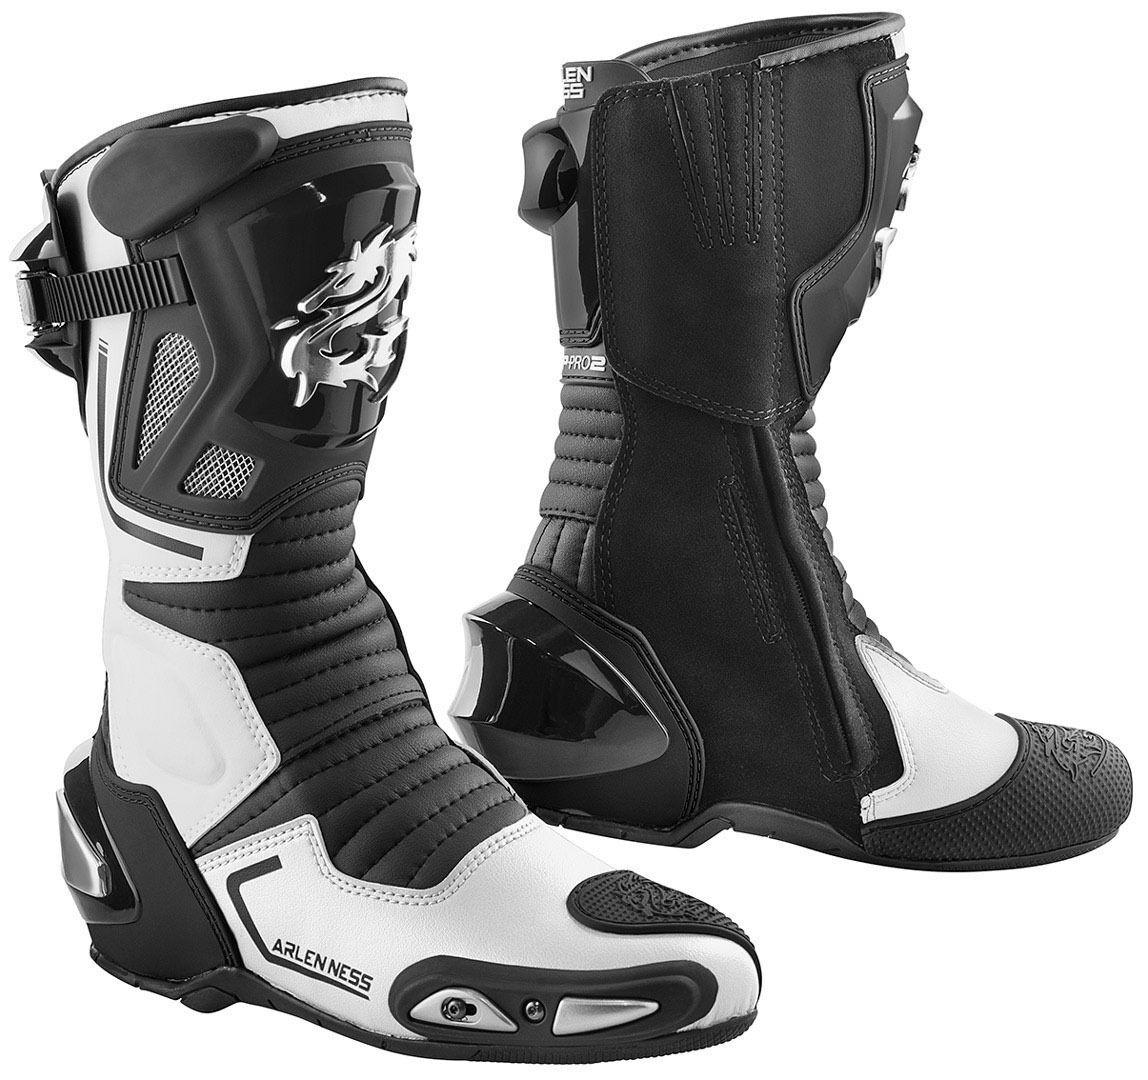 Arlen Ness Sugello Bottes de moto Noir Blanc taille : 38